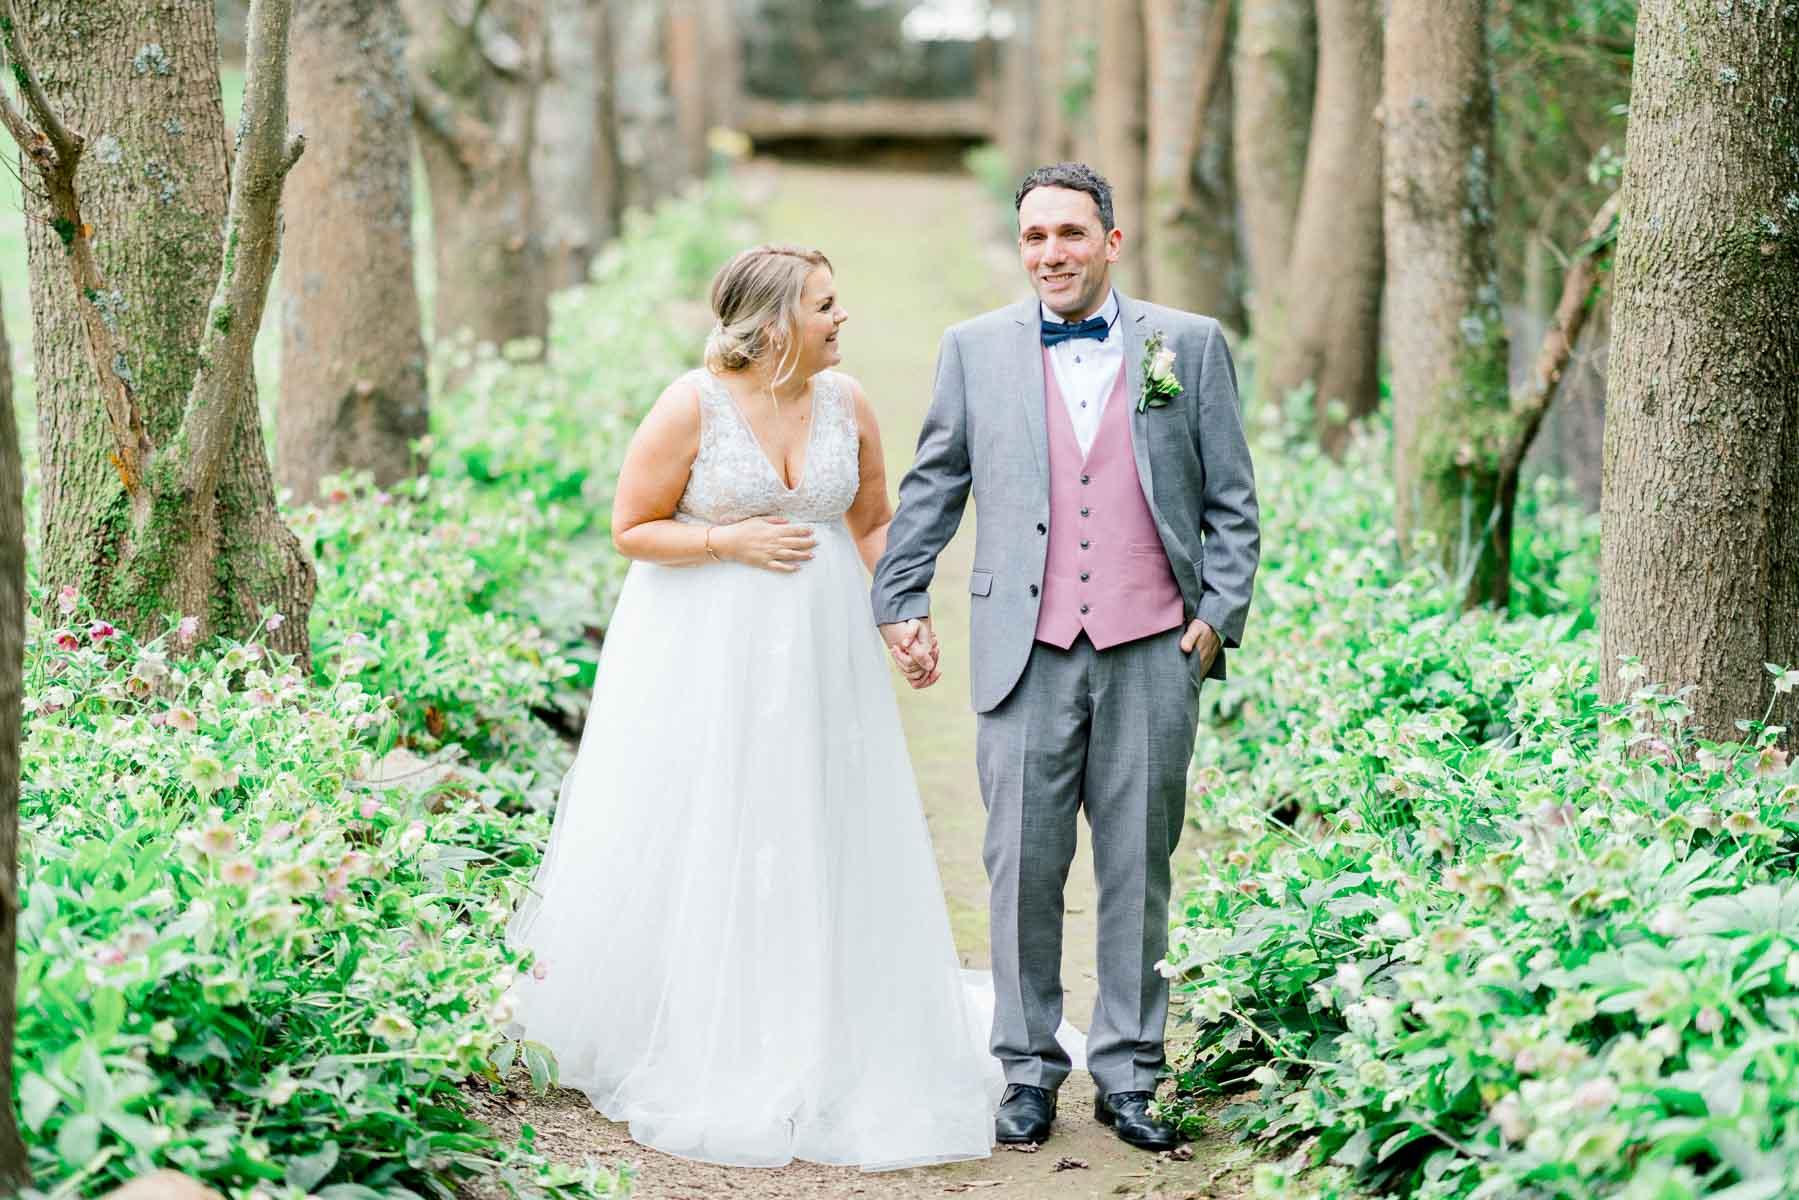 lindenderry-wedding-heart+soul-weddings-amy-alain-03812.jpg